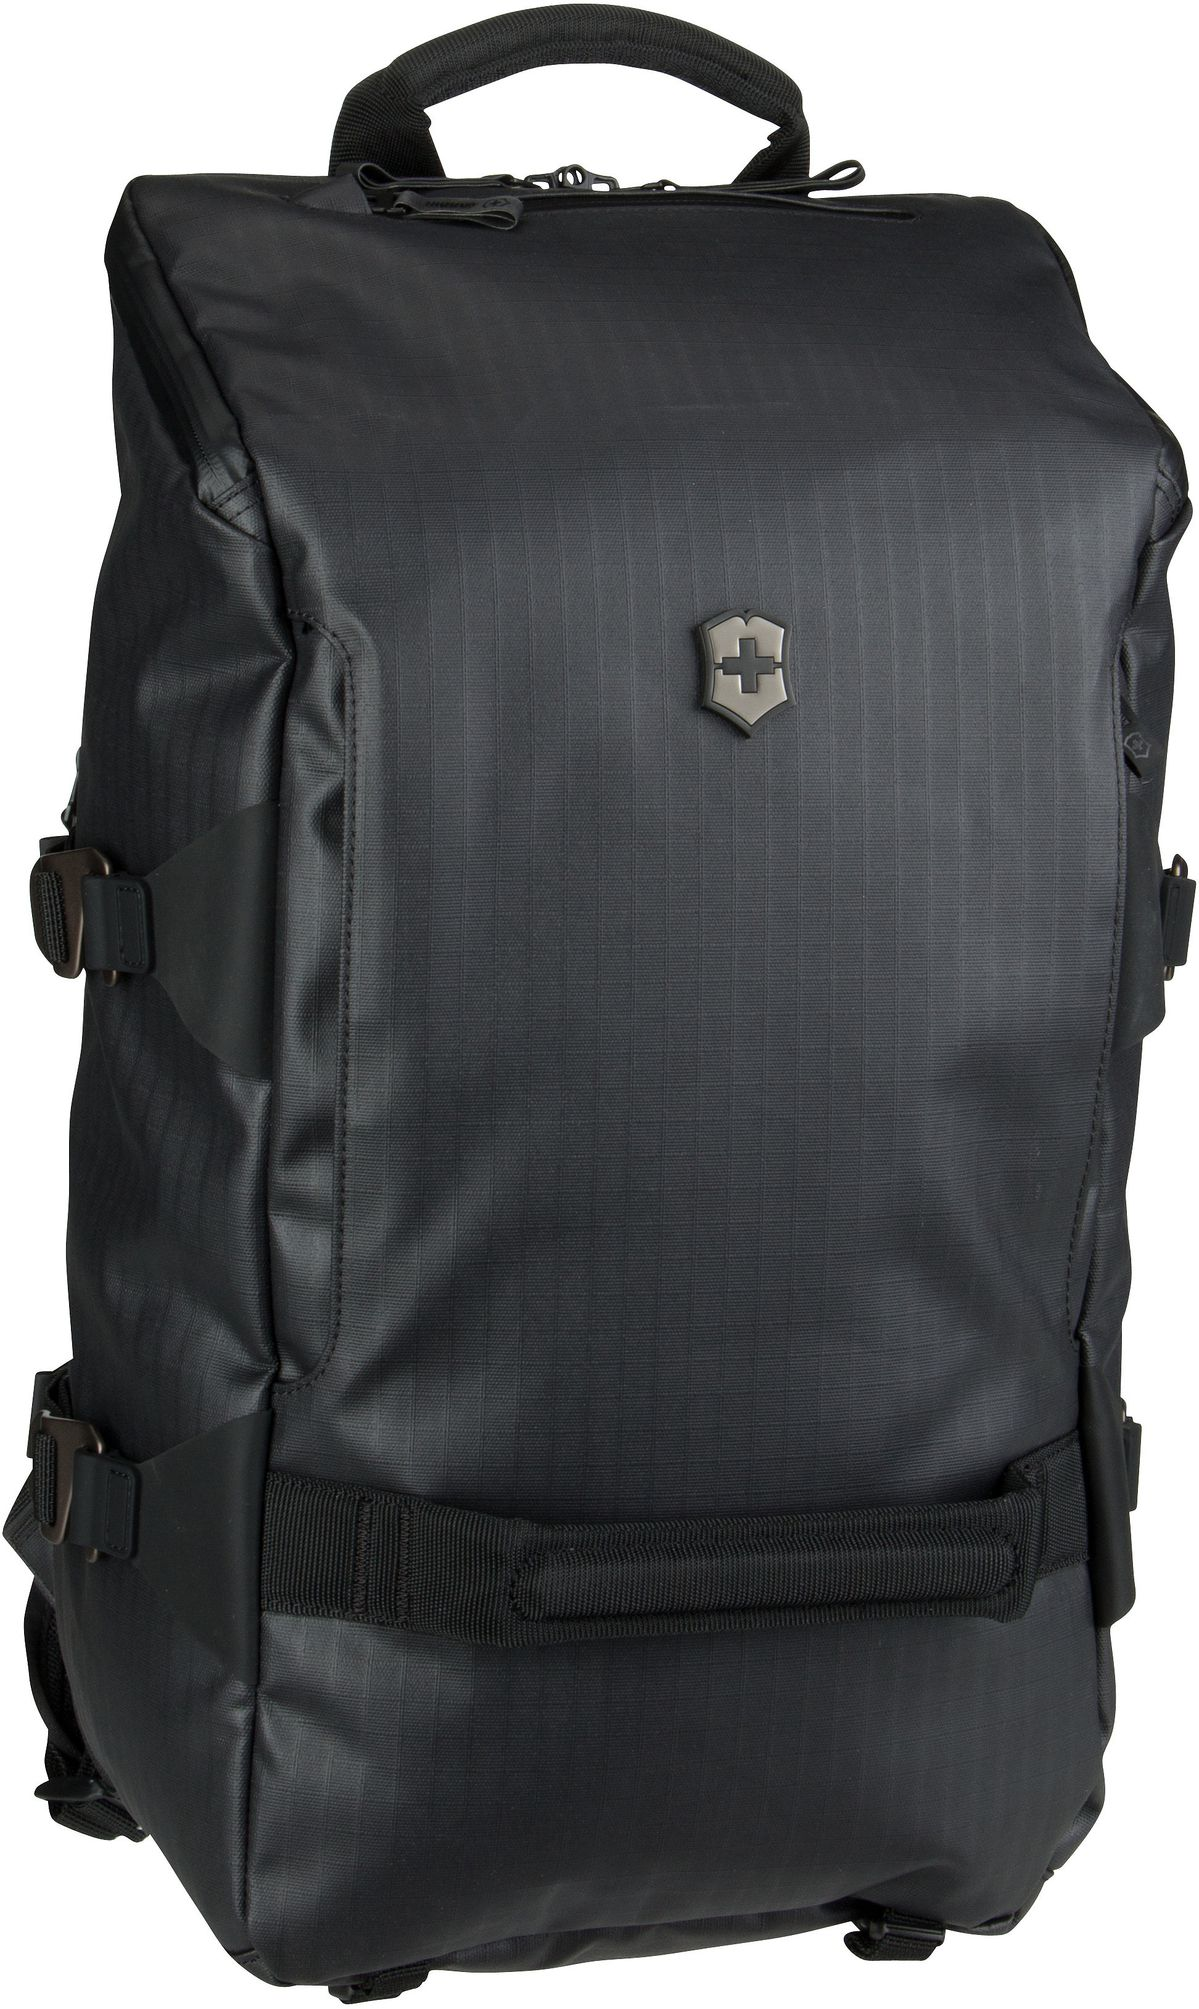 Laptoprucksack Vx Touring Backpack Black (25 Liter)